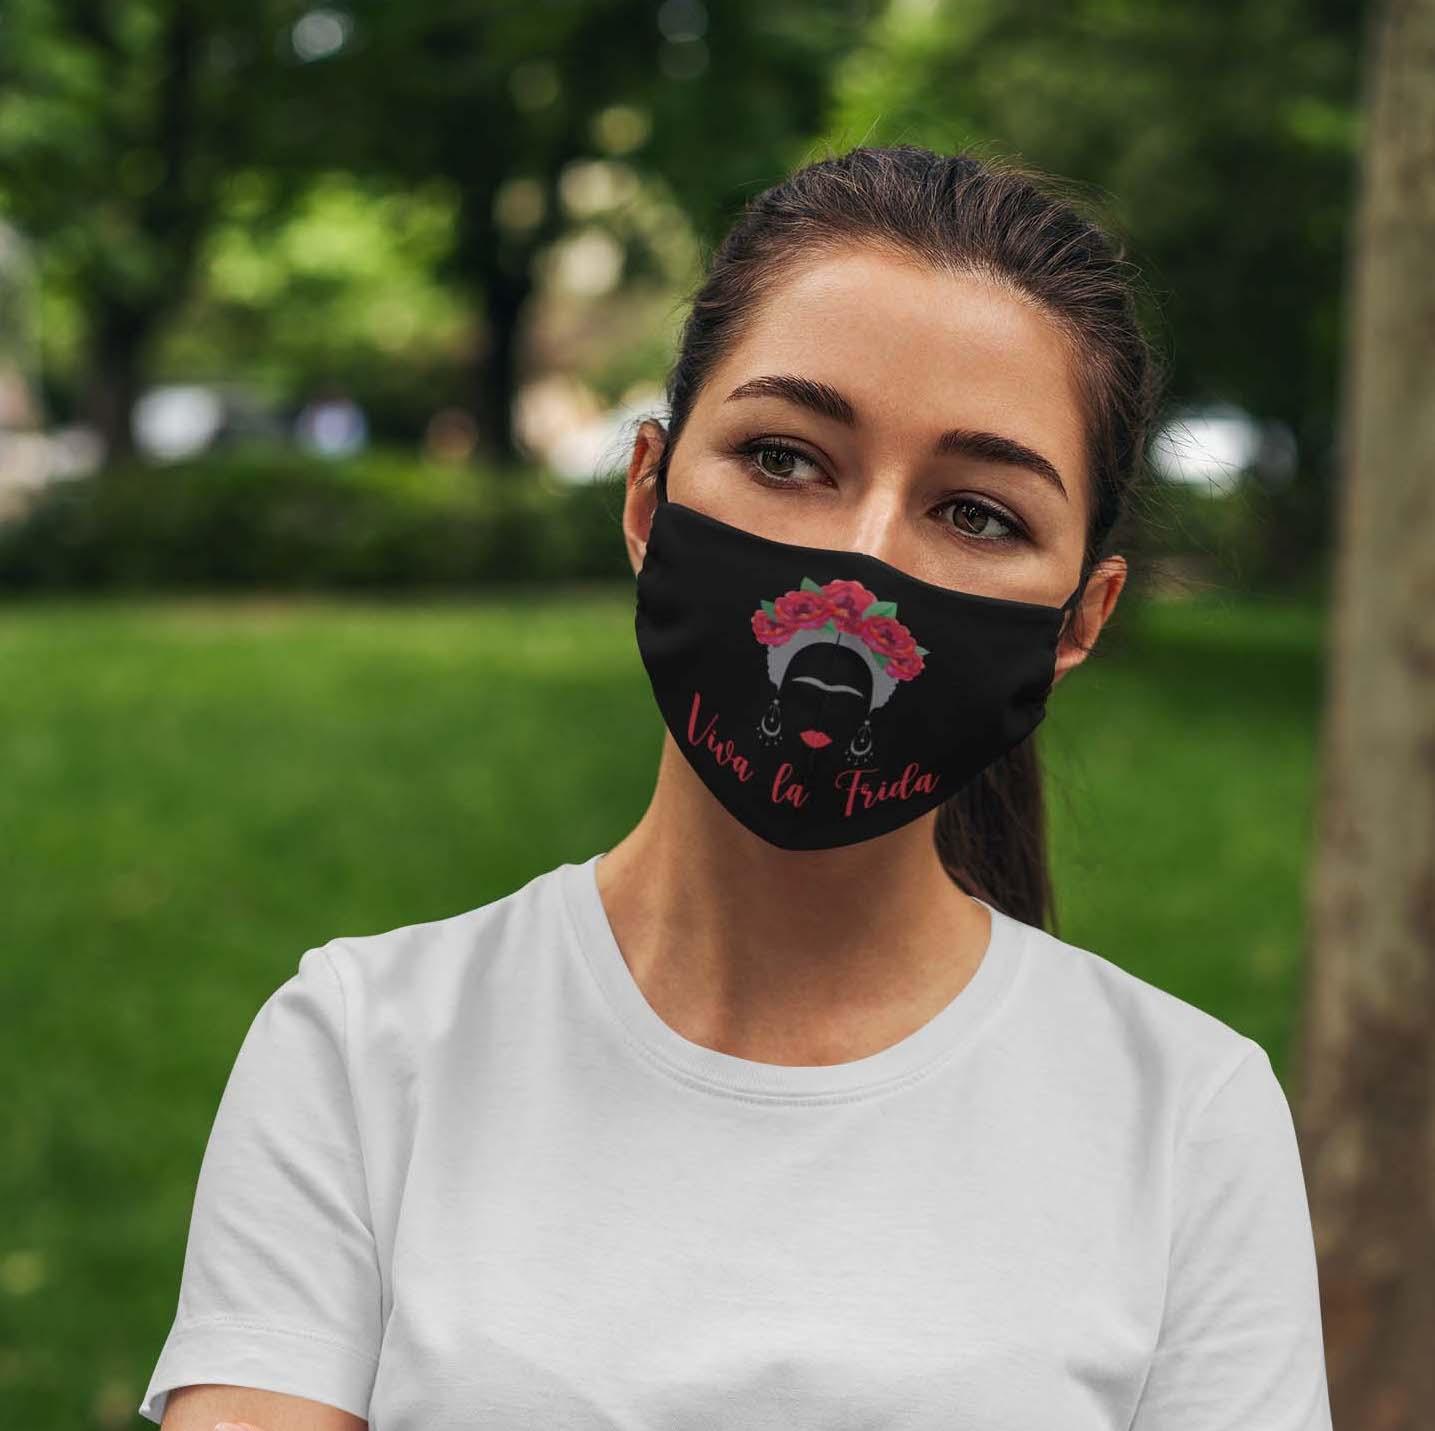 Viva la frida kahlo feminist anti pollution face mask 2